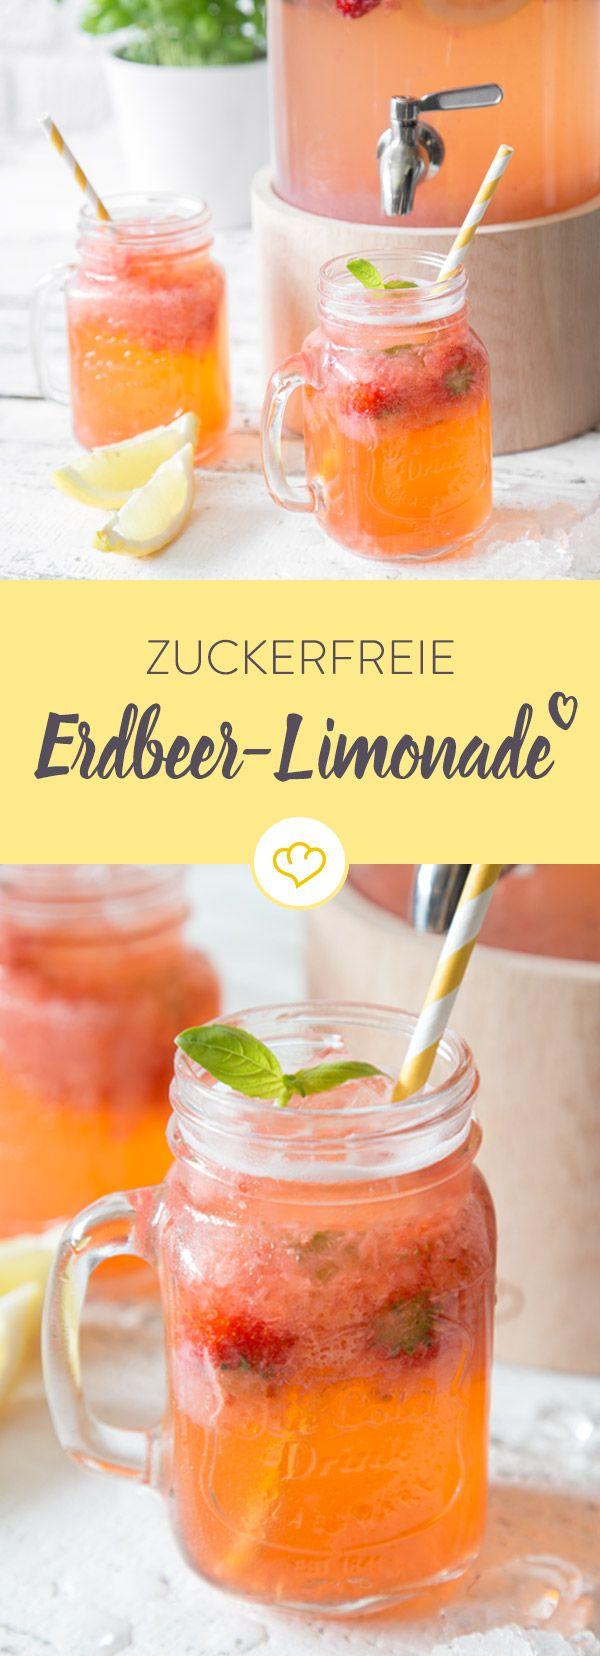 Zuckerfreie Erdbeer-Basilikum-Limonade   Rezept   Limonade ...